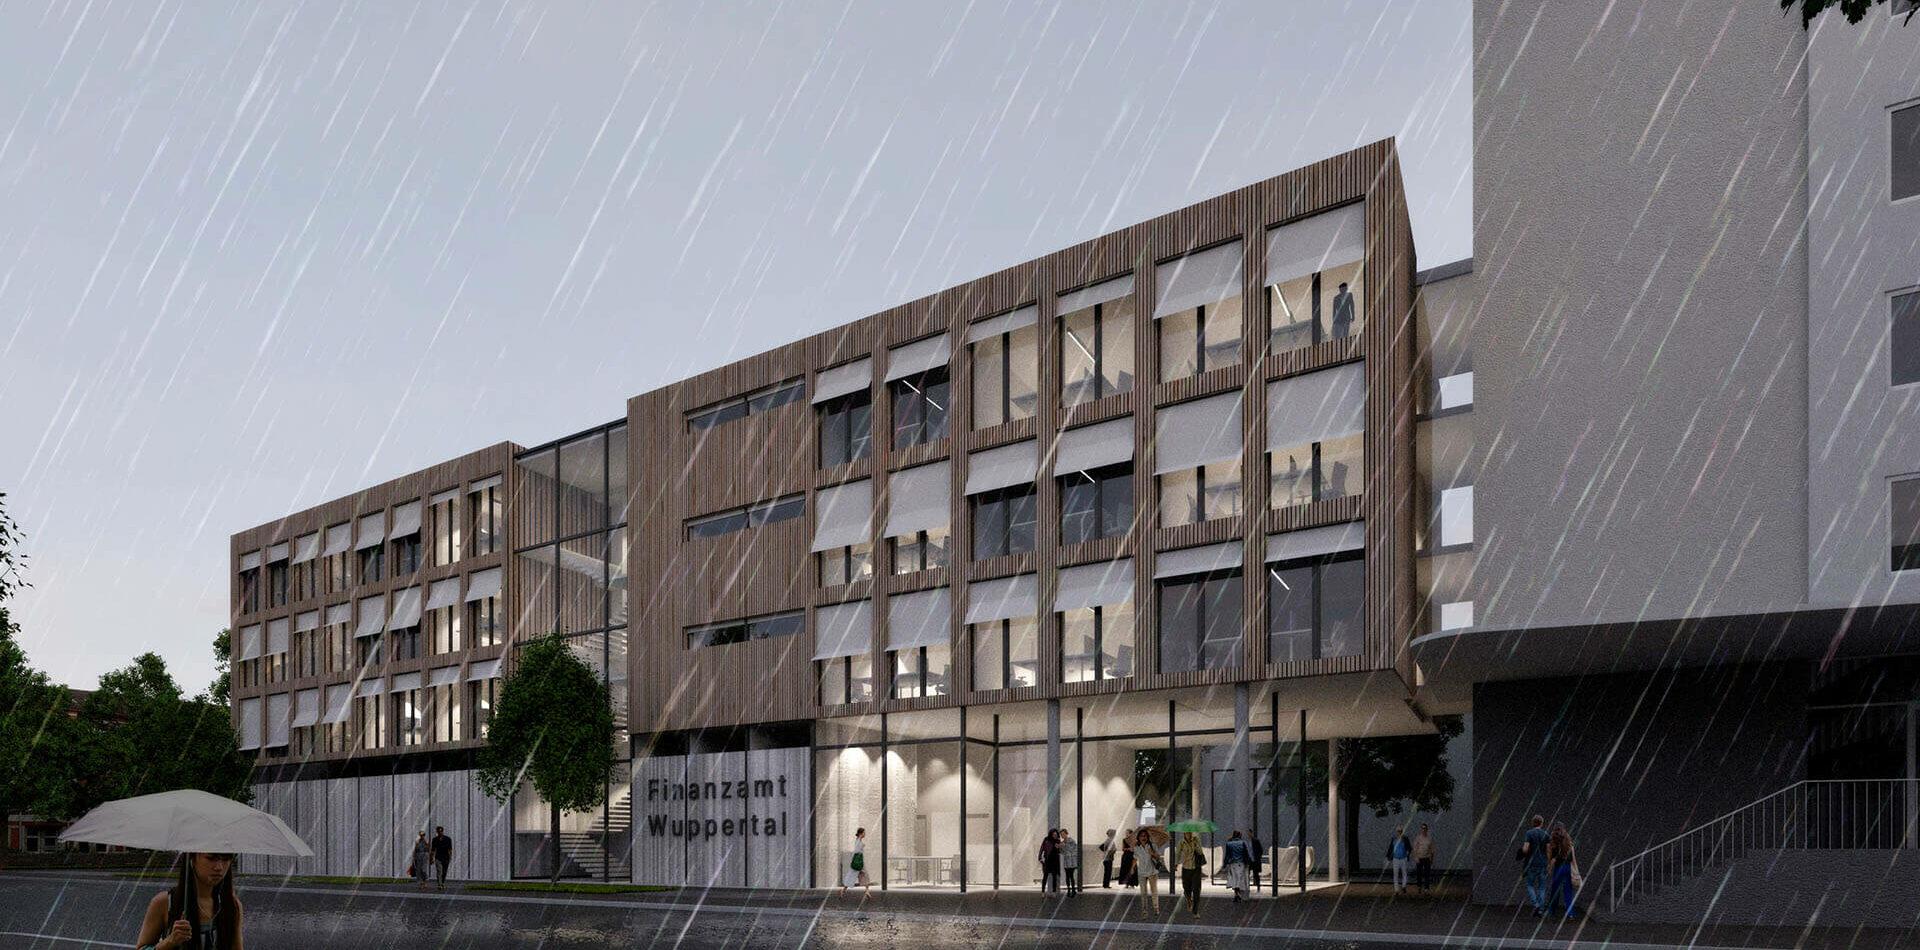 Wuppertal Finanzamt Barmen 2ter Preis Visualisierung front 2